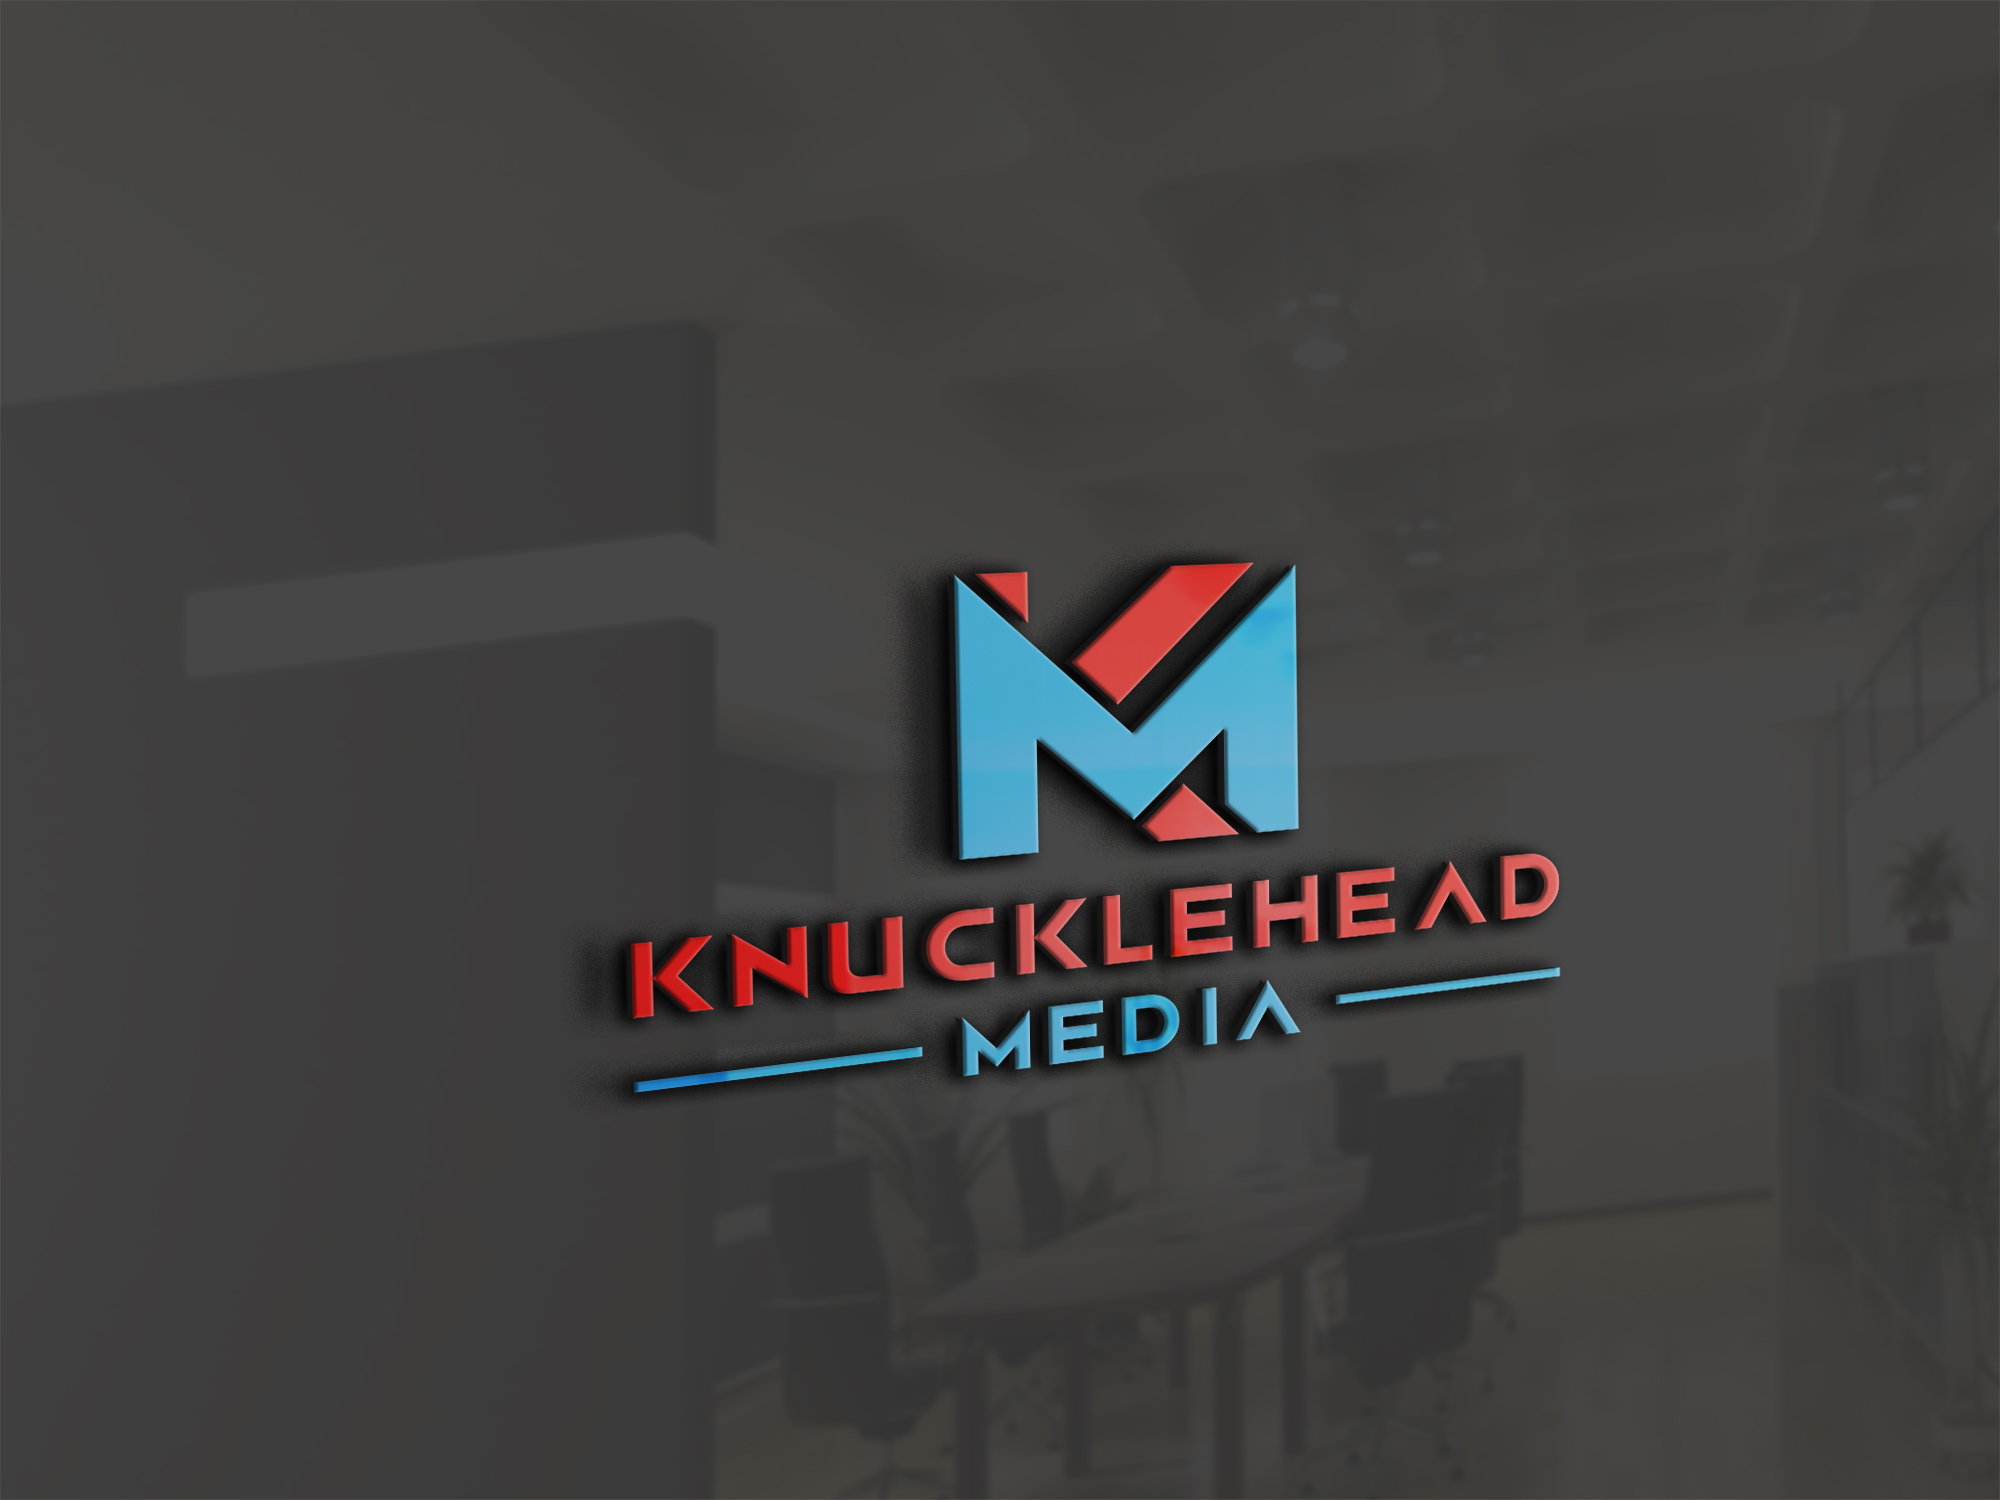 Logo Design by Raymond Garcia - Entry No. 24 in the Logo Design Contest Imaginative Logo Design for knucklehead media.